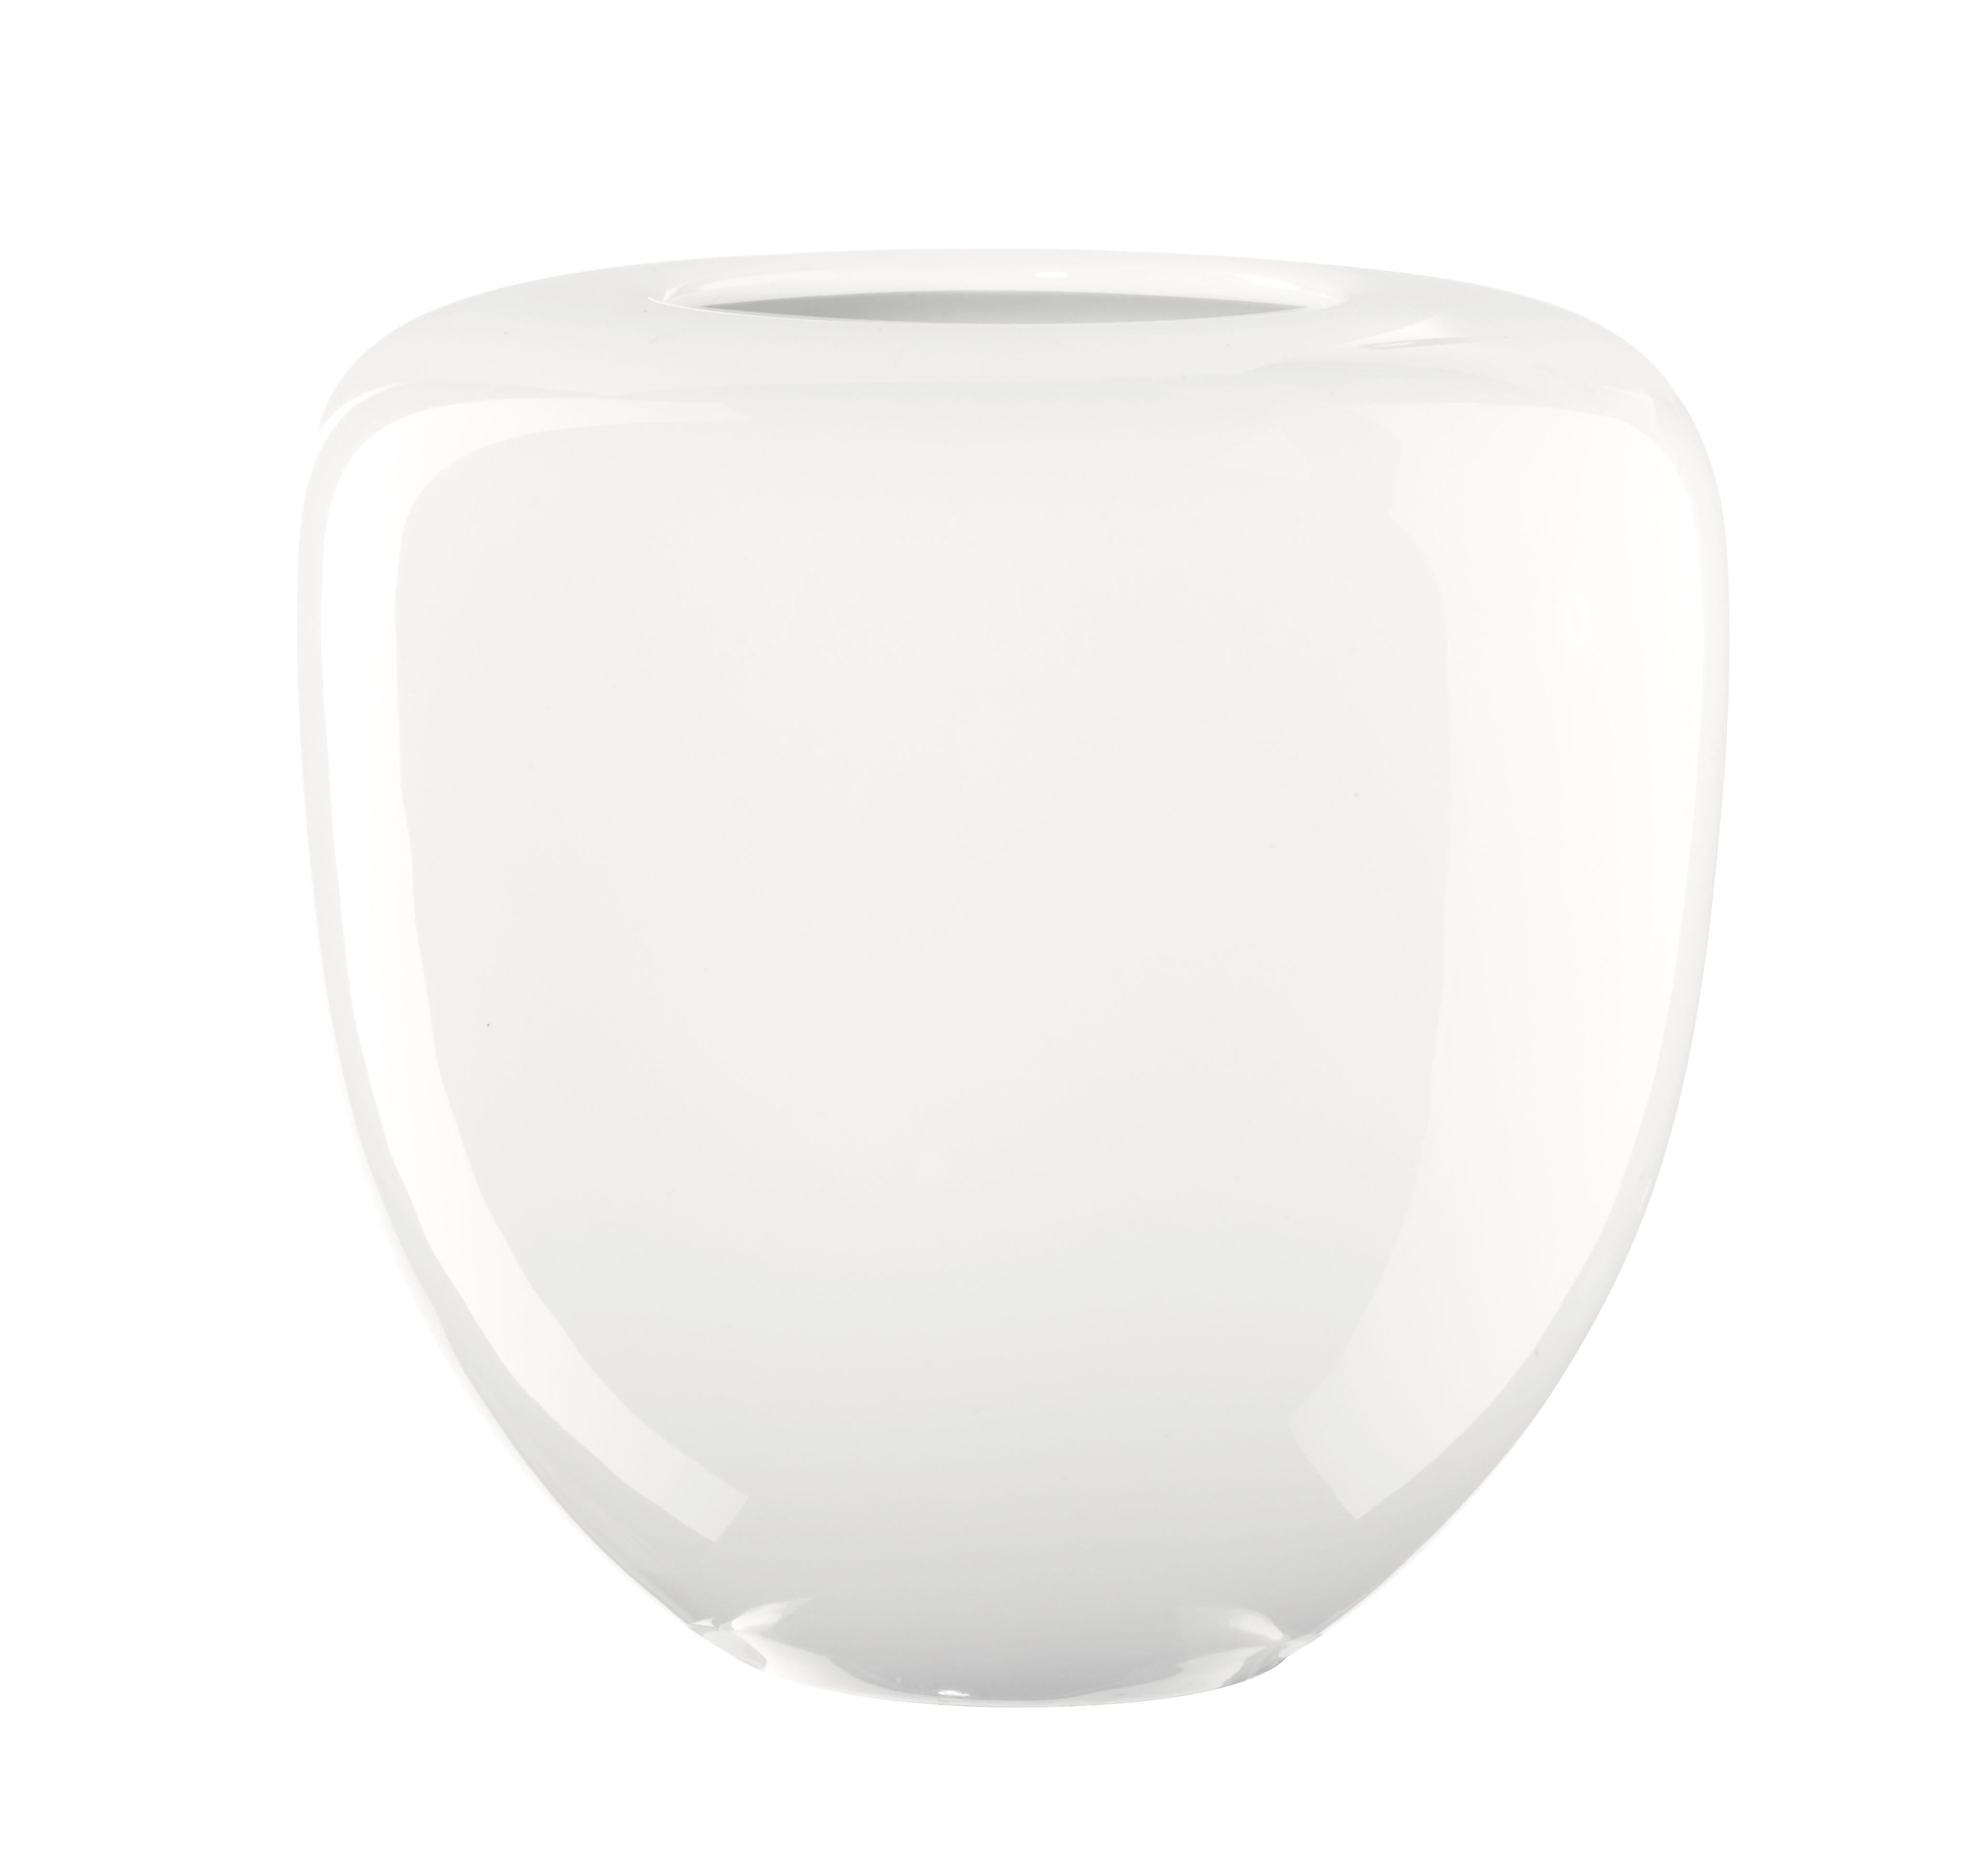 VASE - Weiß, Basics (9.3/9cm) - ASA